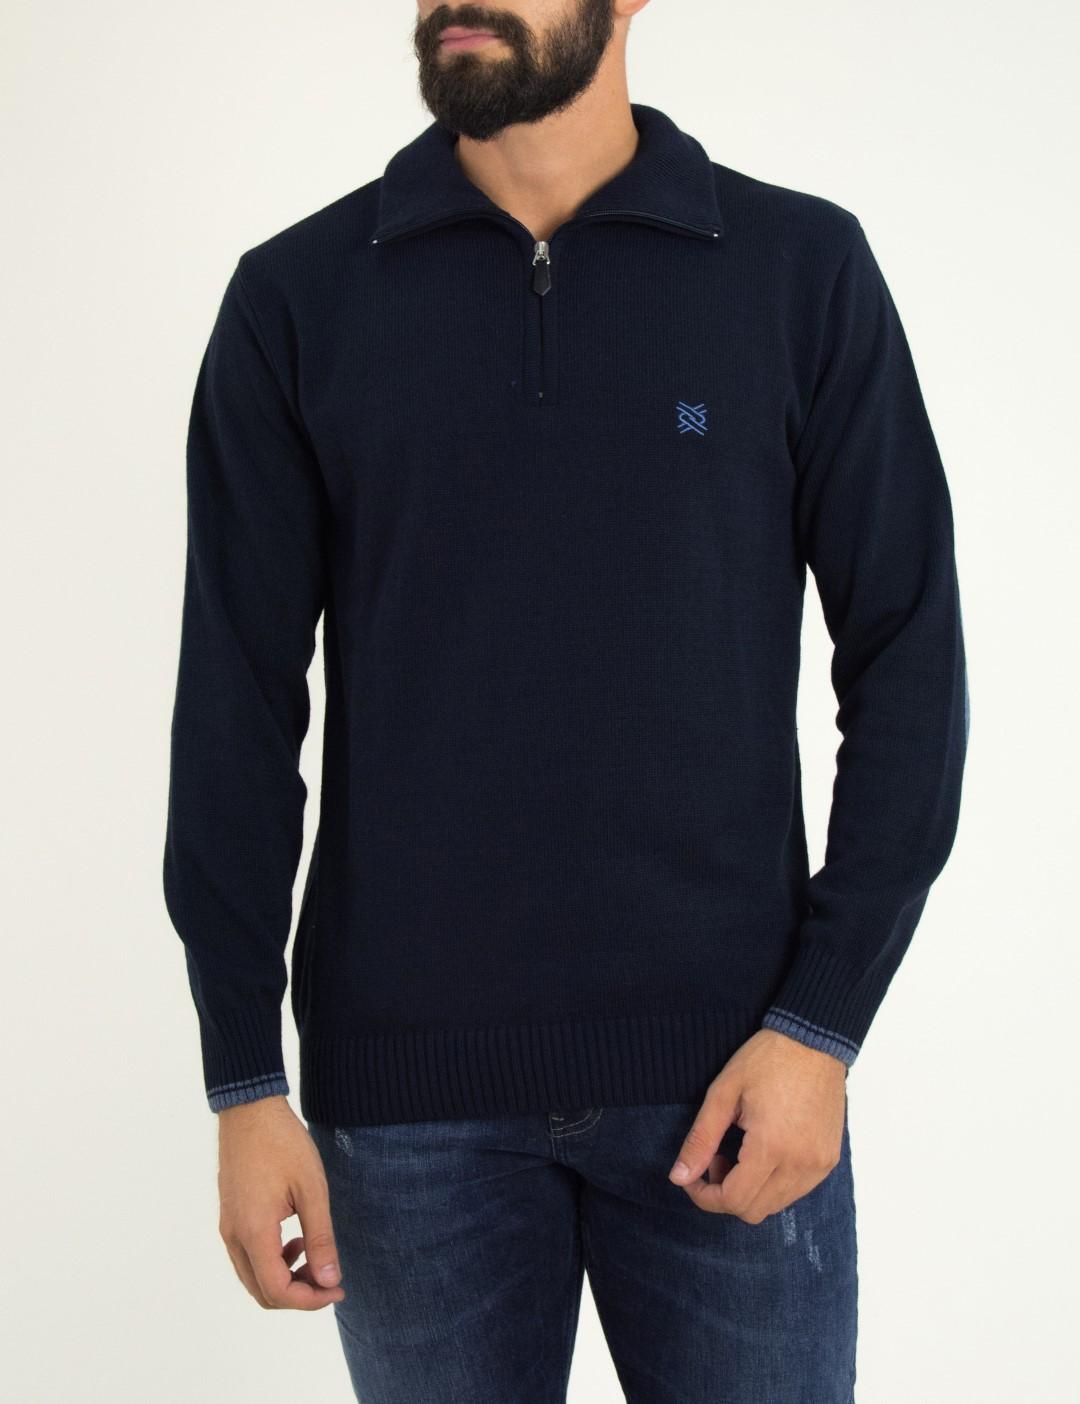 ee7258280515 Ανδρικό μπλε πουλόβερ μονόχρωμο με γιακά Darious 18566G